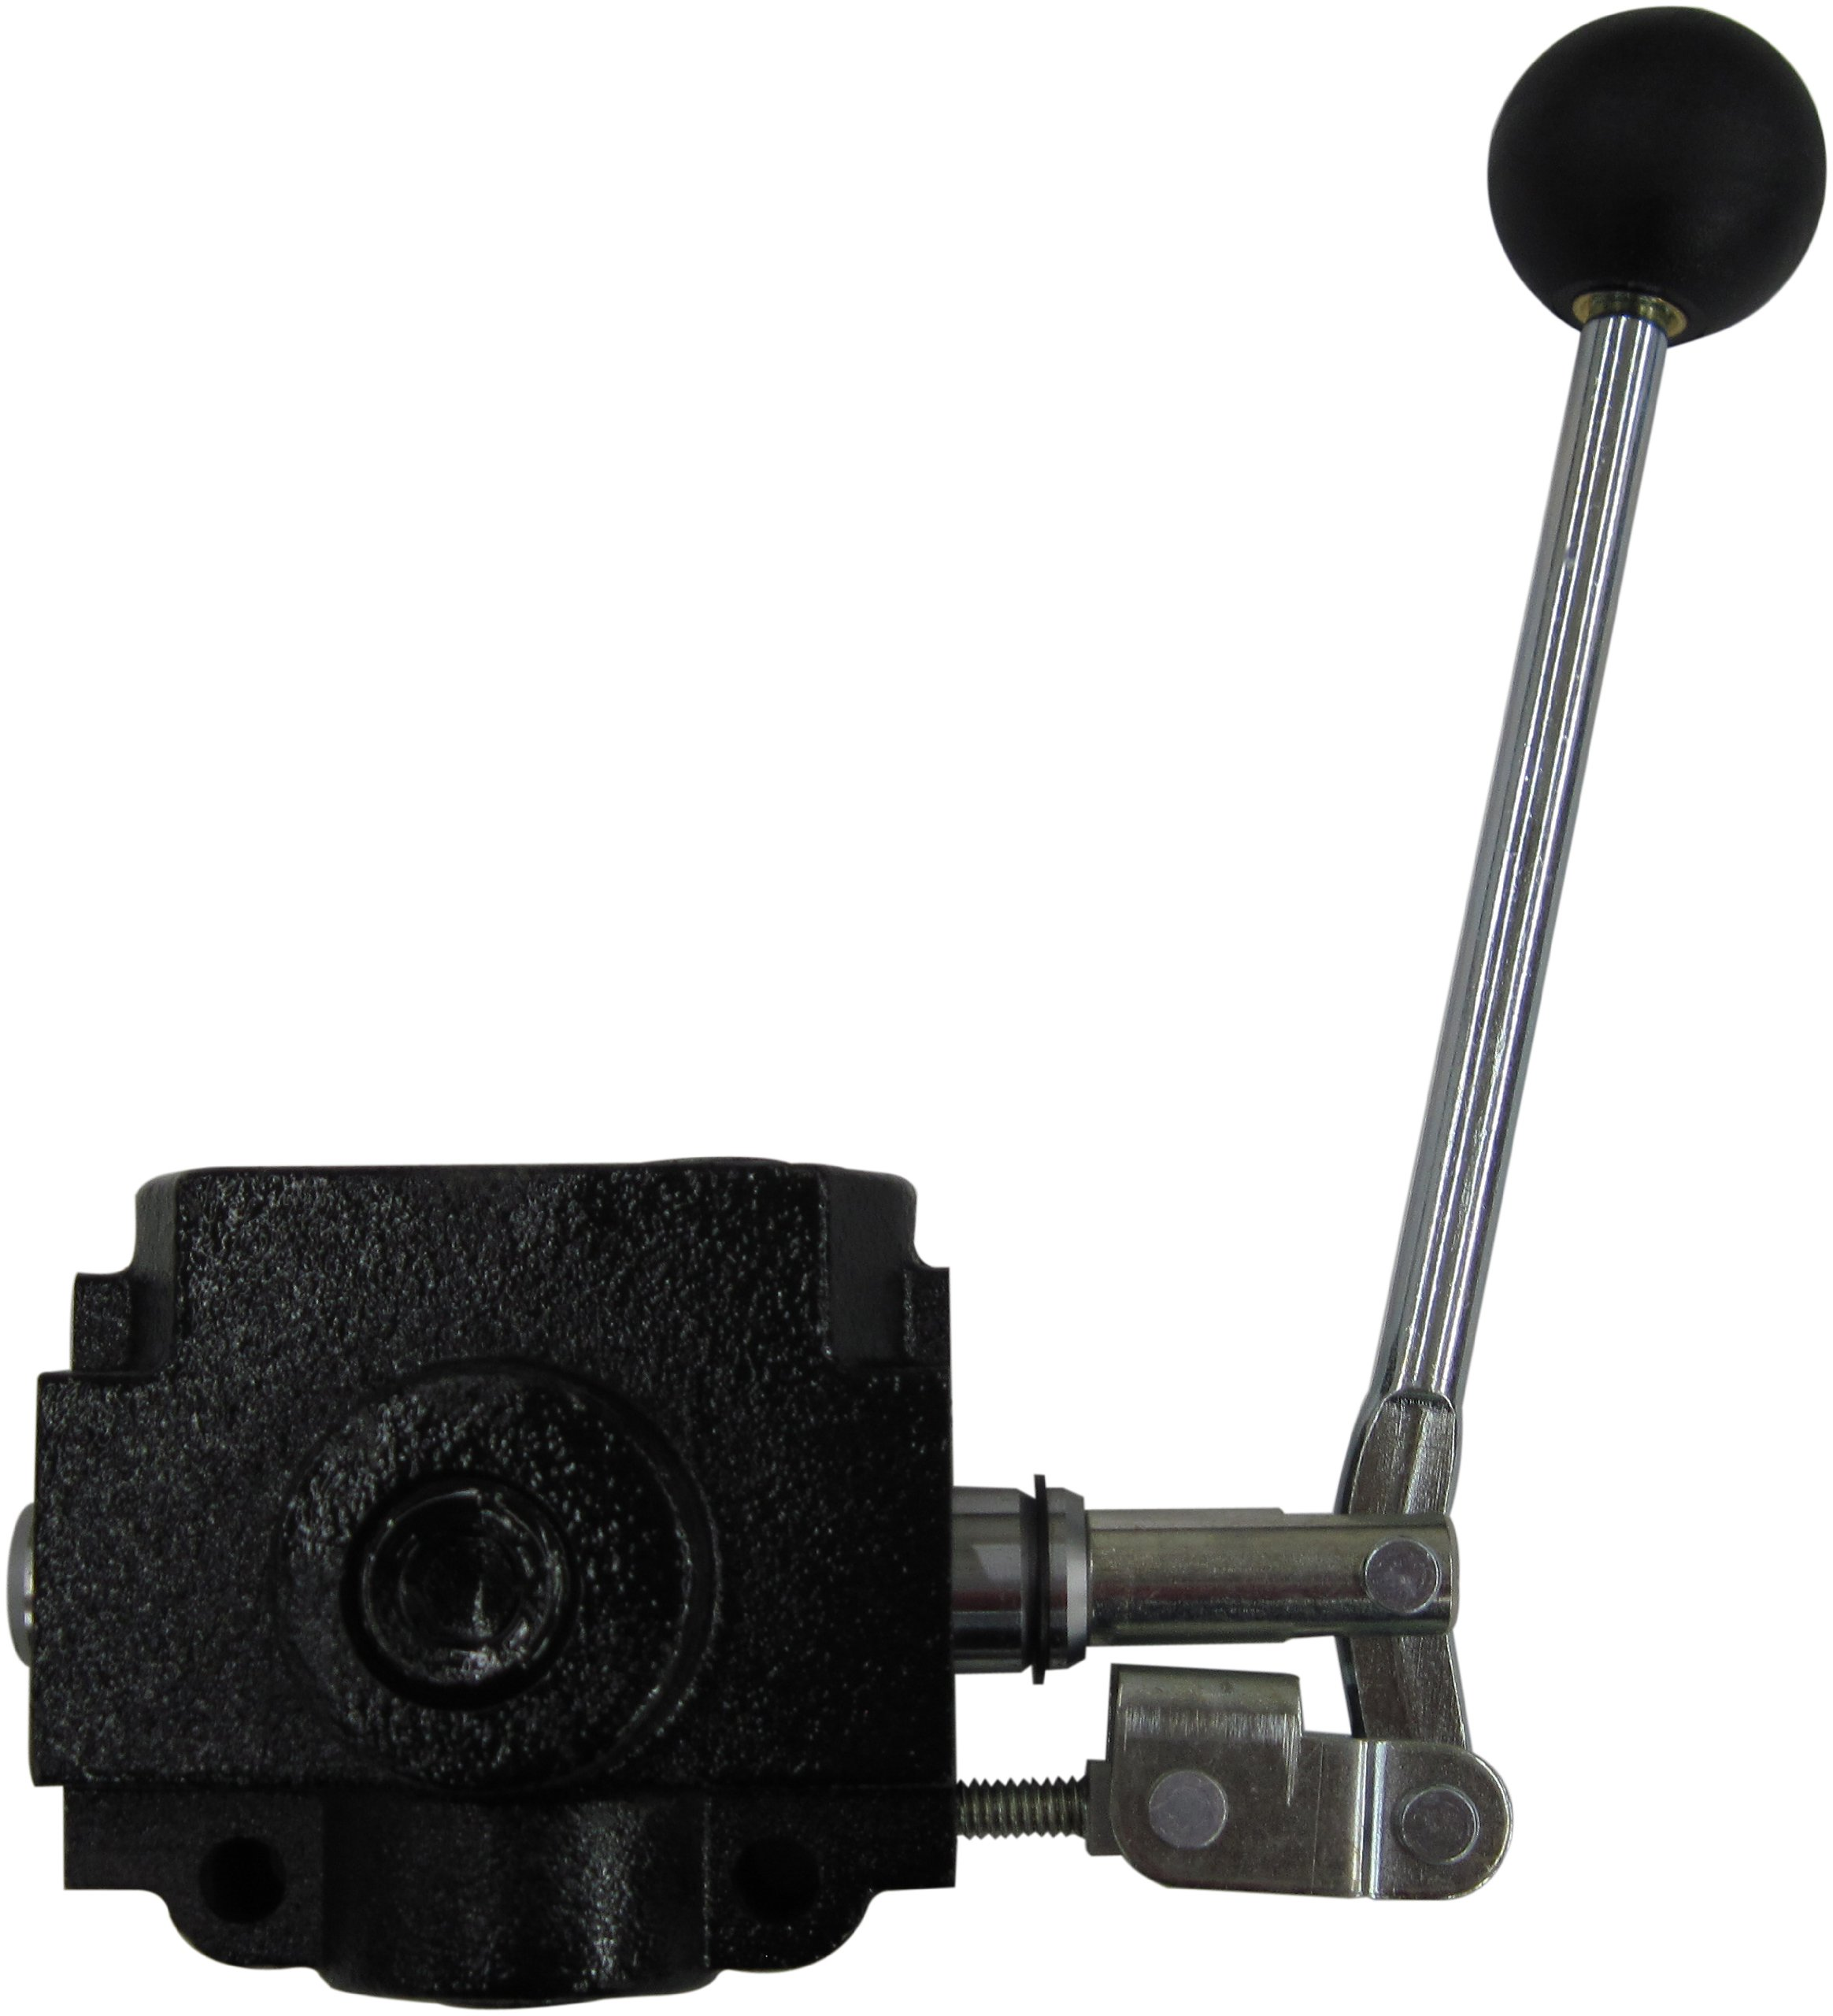 Prince SS-2A1E Selector Valve, Monoblock, Cast Iron, 1 Spool, 3 Ways, 2 Positions, Lever Handle, 2500 psi, 20 gpm, 1/2'' NPT Female